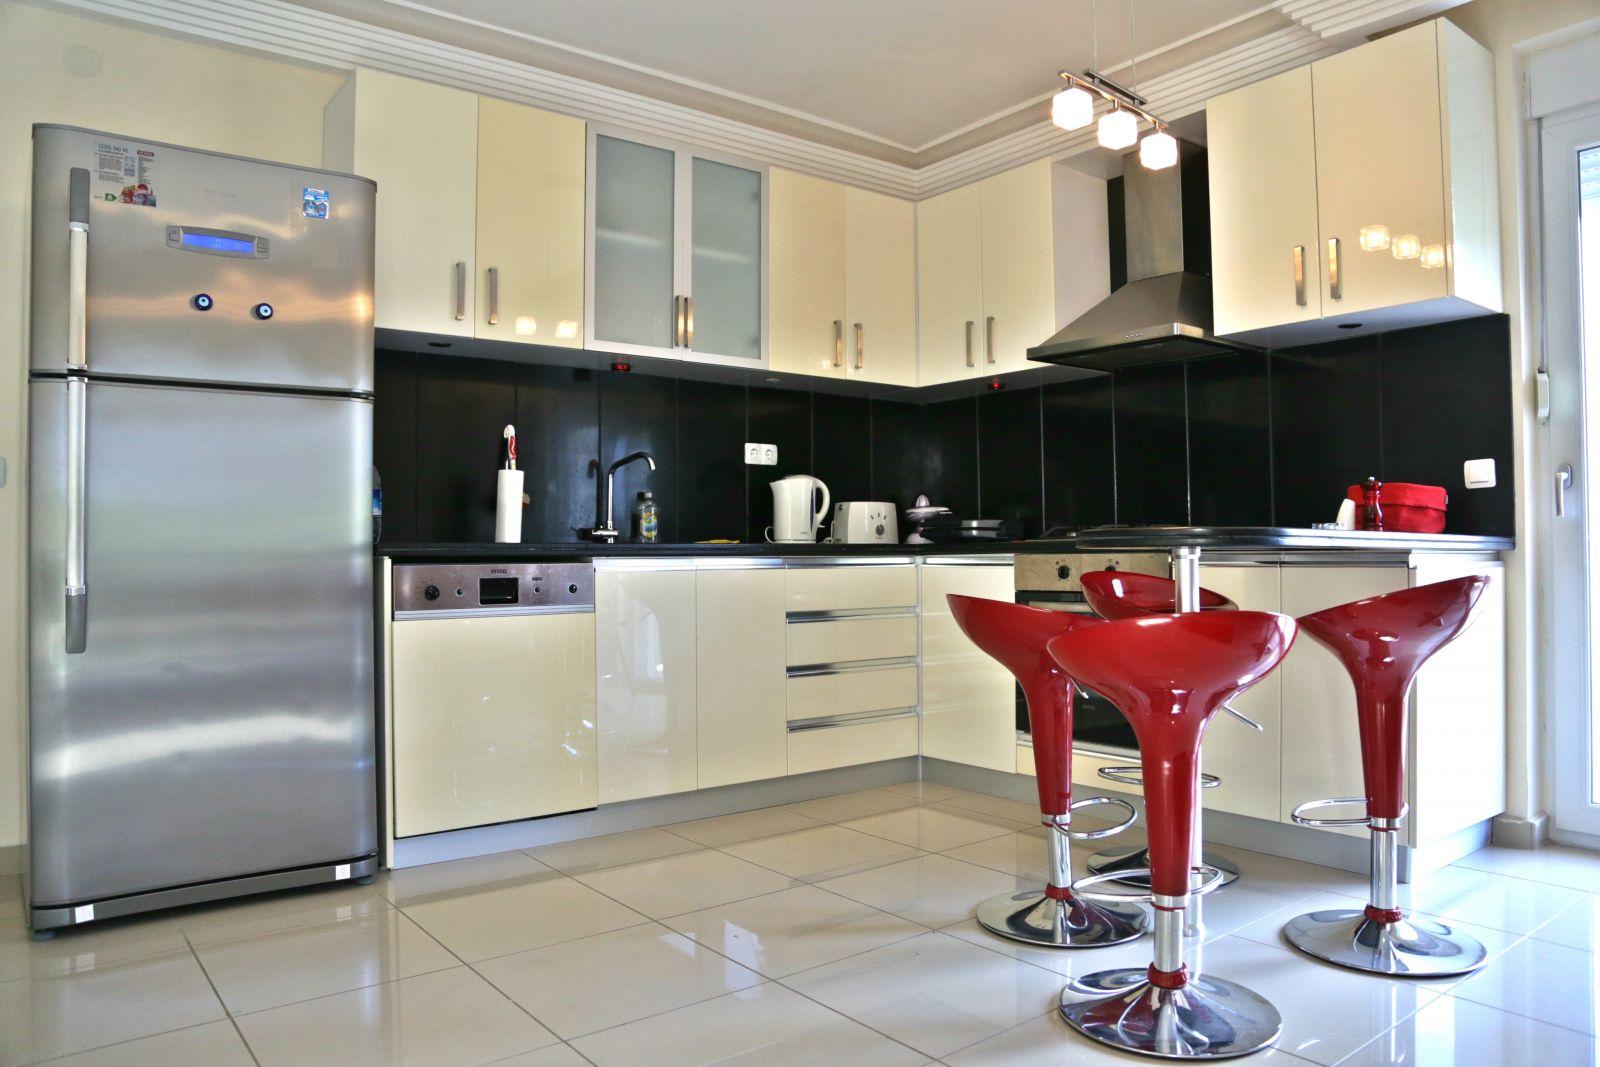 Сдача недвижимости в аренду в Турции